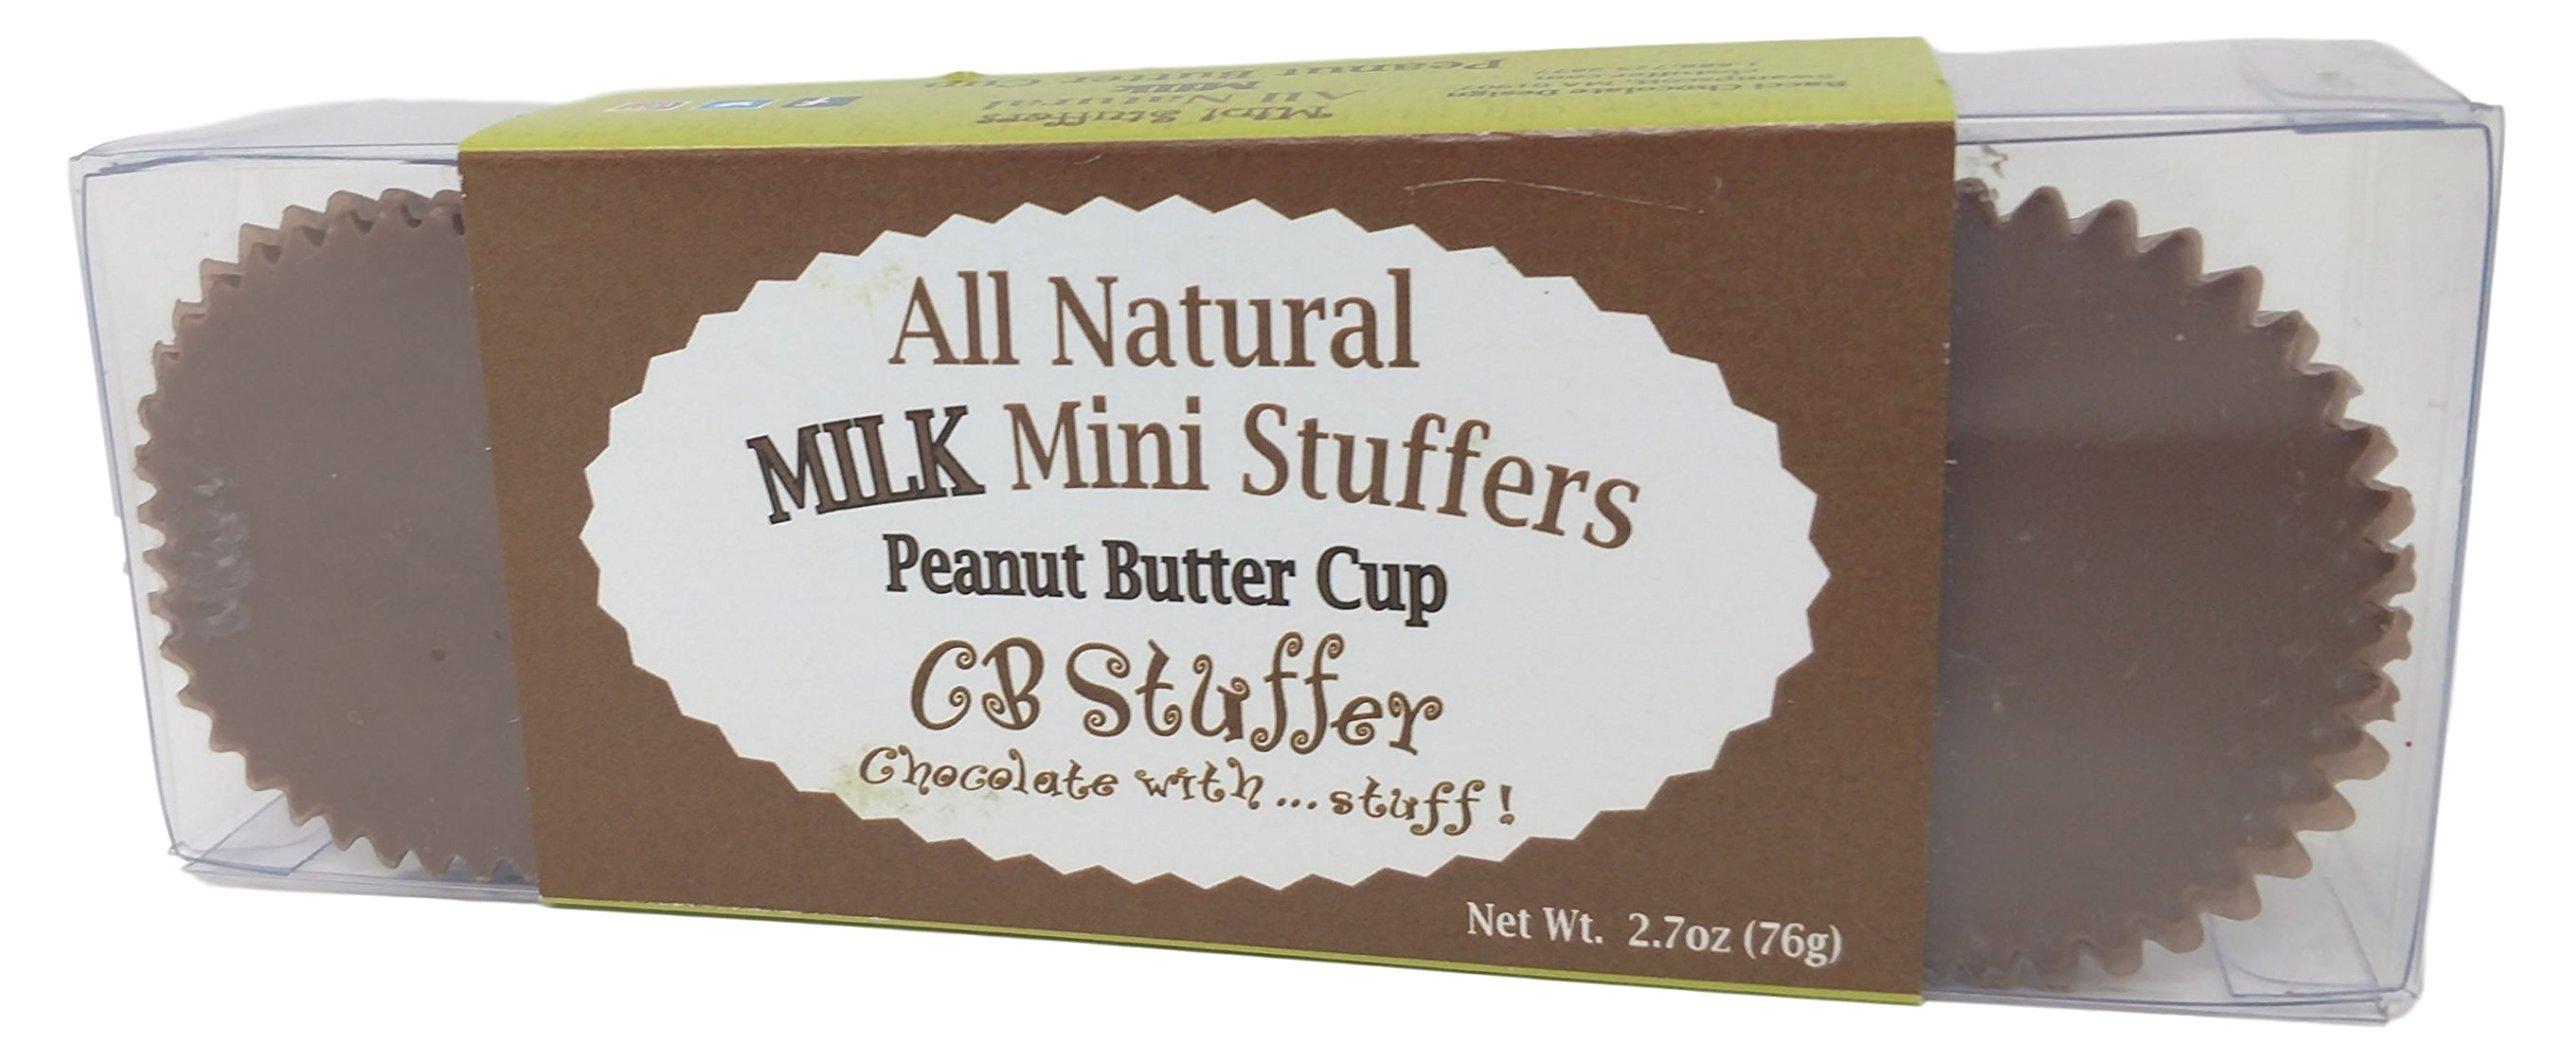 CB Stuffer All Natural Milk Mini Stuffers 3 cups 2.7 Ounces